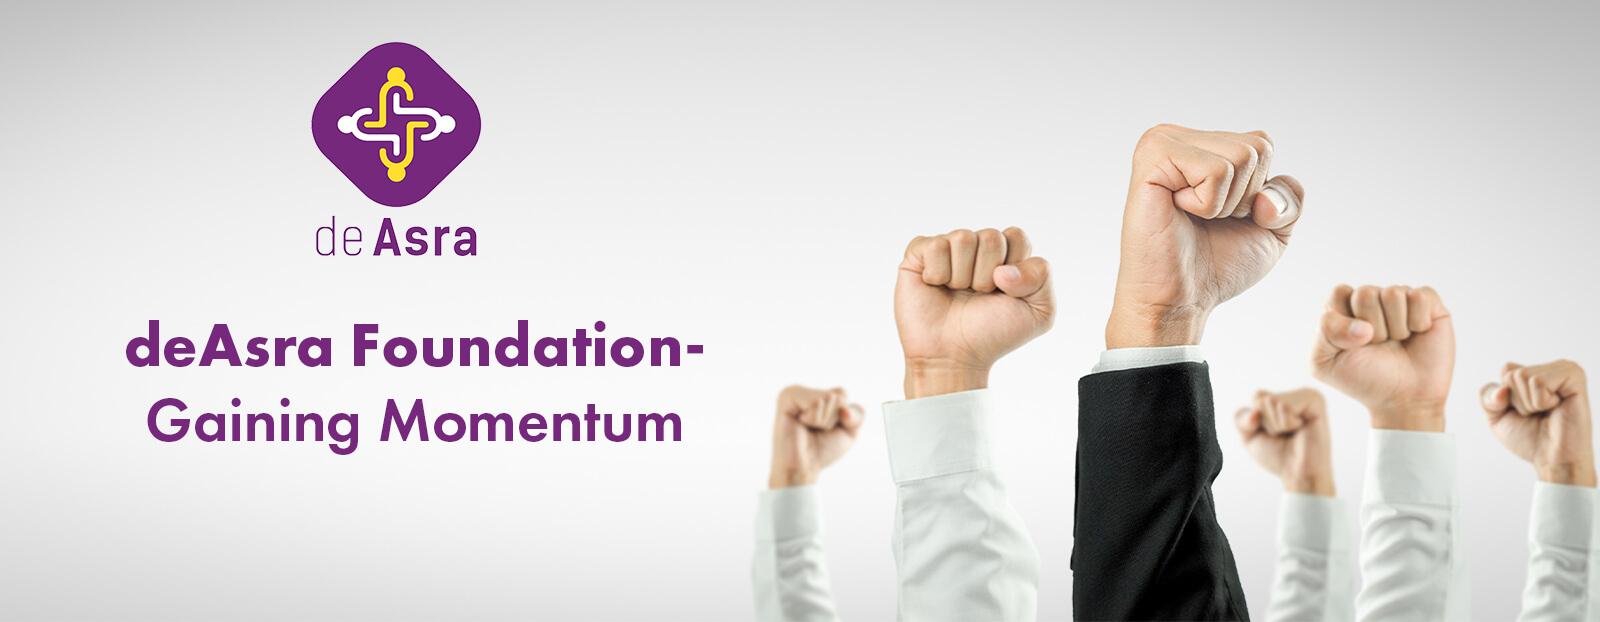 deAsra Foundation- Gaining Momentum